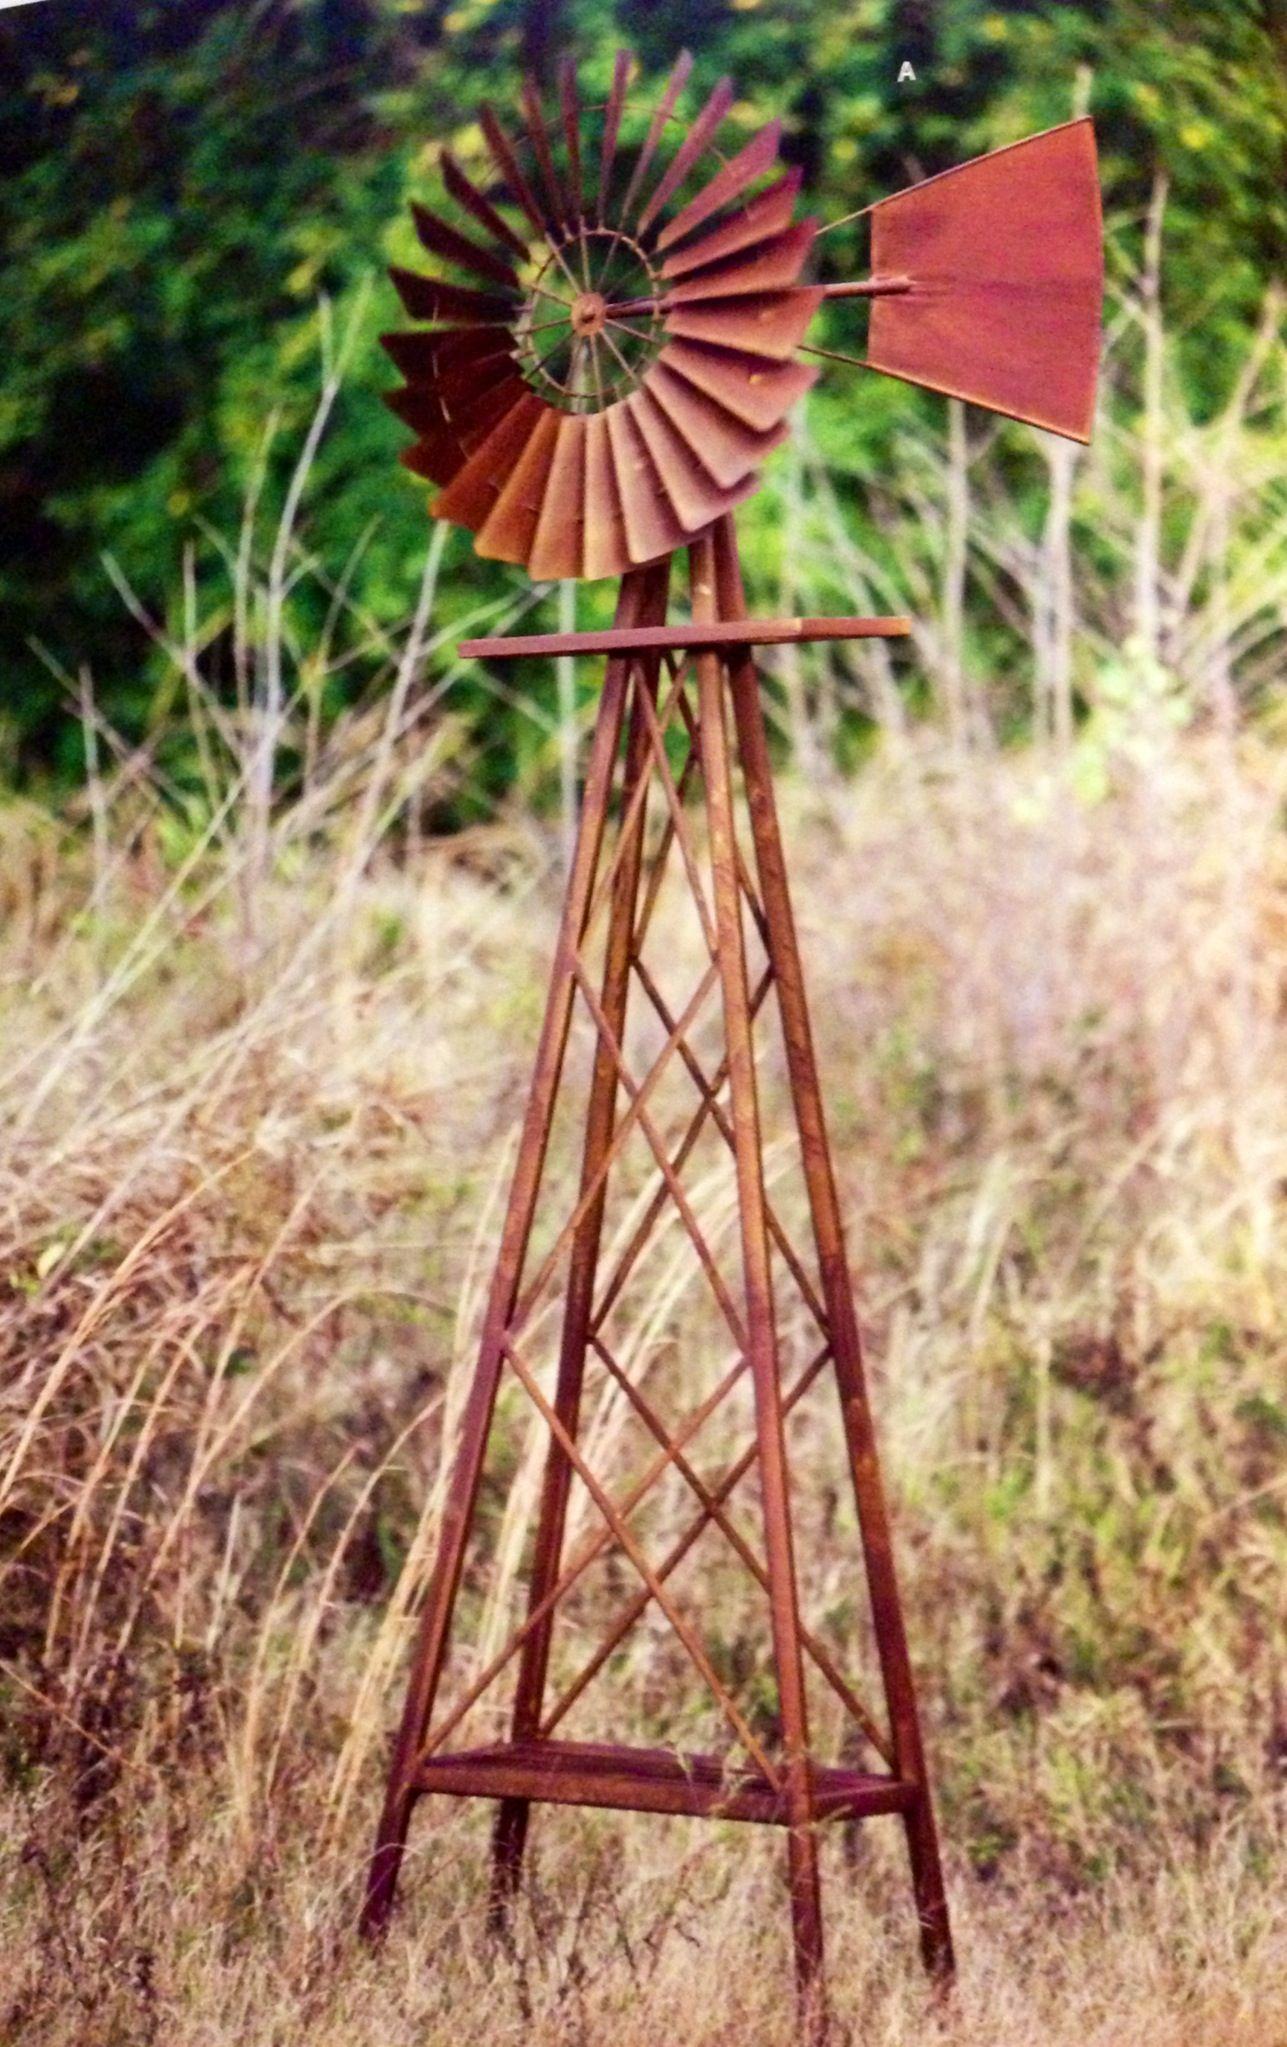 Vintage Garden Windmill Garden Windmill Windmill Design Garden